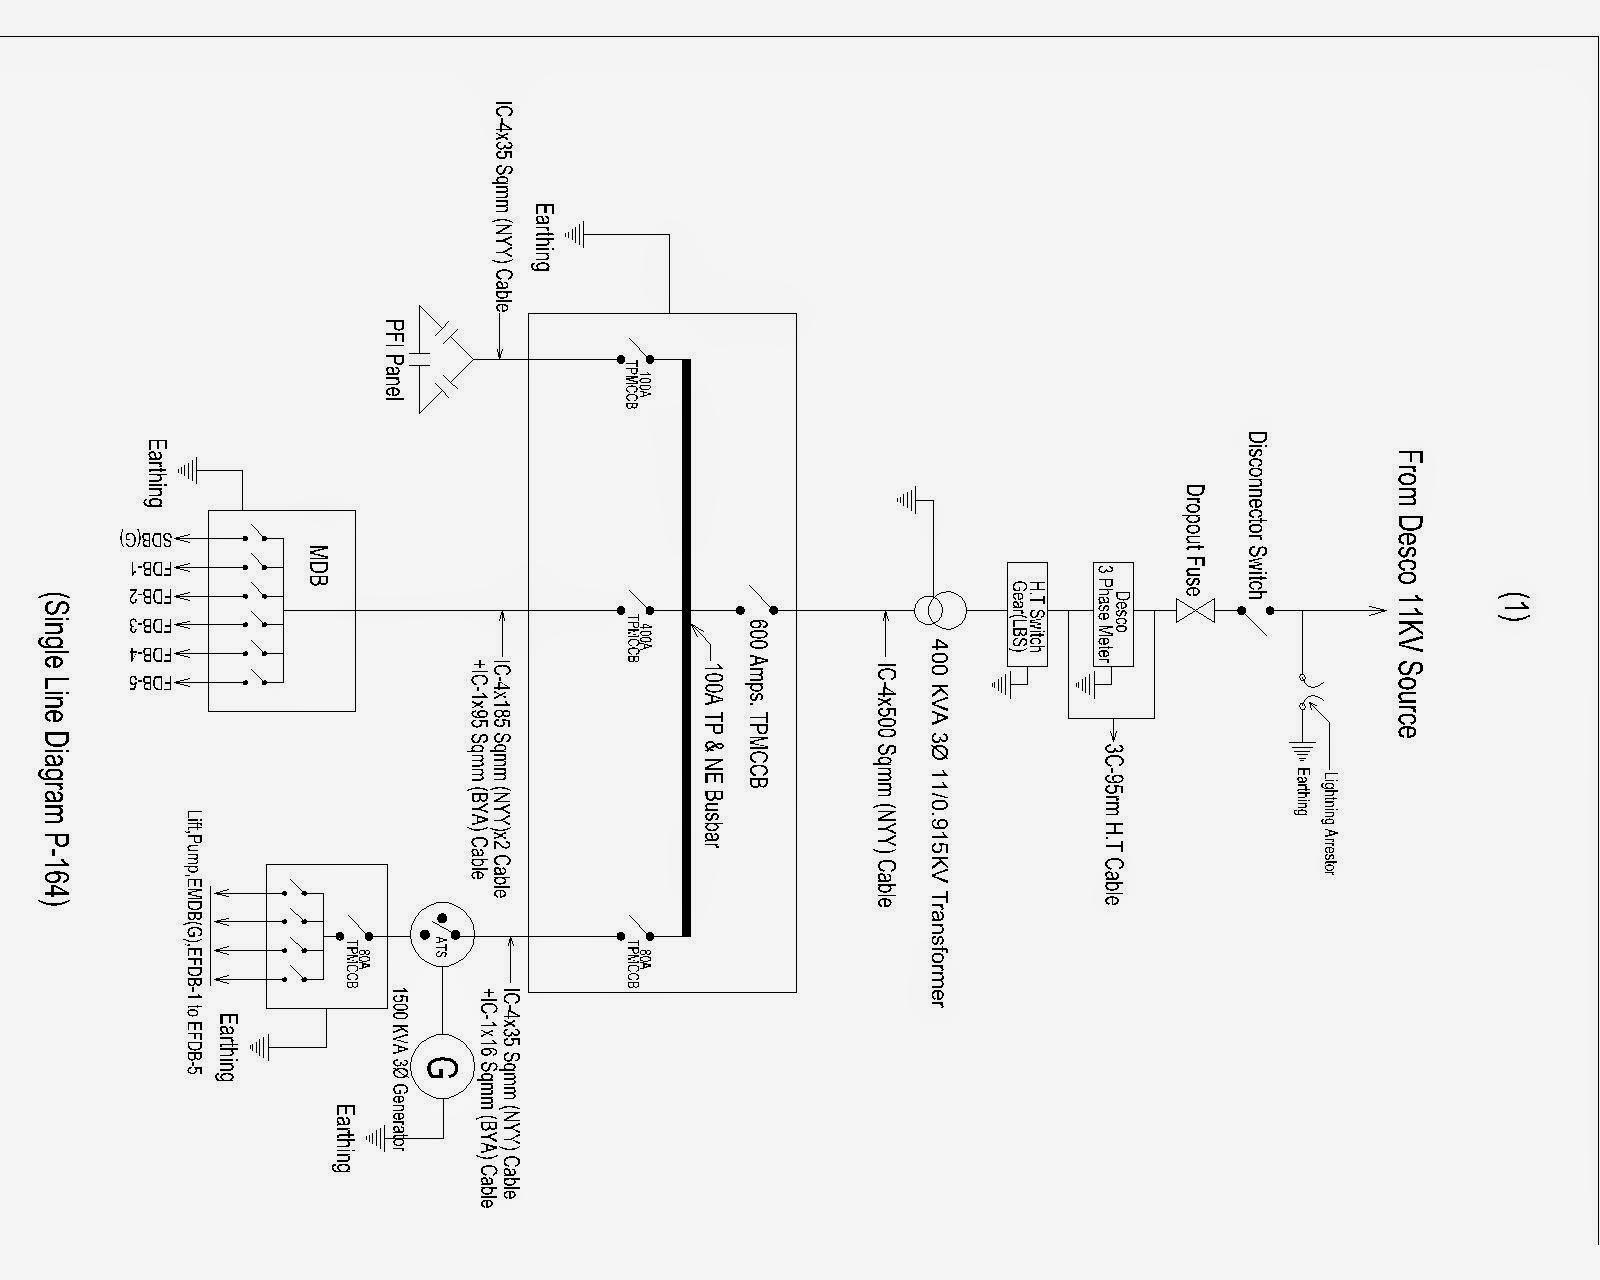 small resolution of penerangan gambar single line wiring diagram free vehicle wiring 3 phase convection oven wiring diagram 3